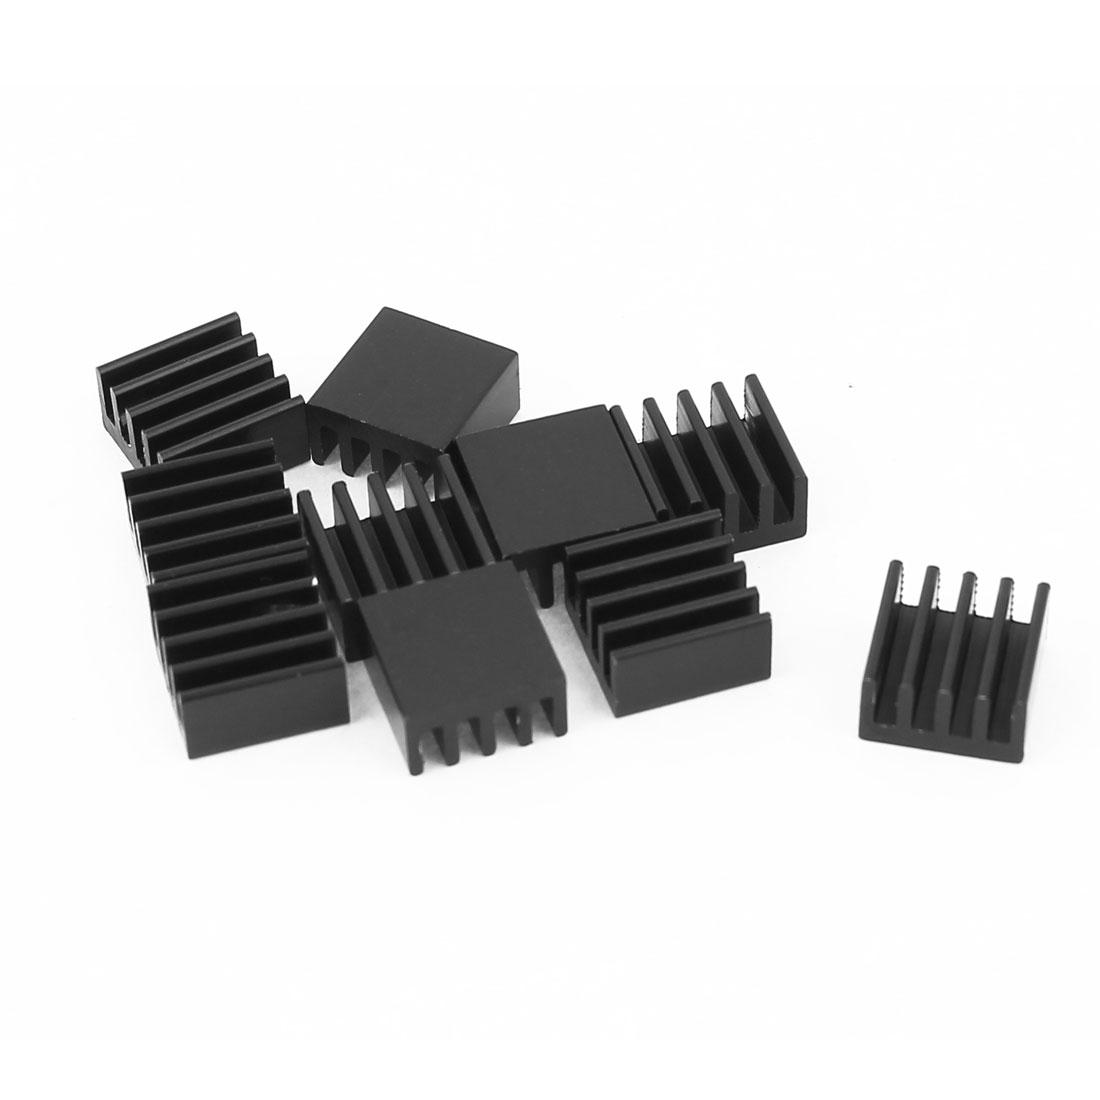 Aluminium Radiator LED Heatsink Heat Sink Black 8.8mmx8.8mmx5mm 10 Pcs